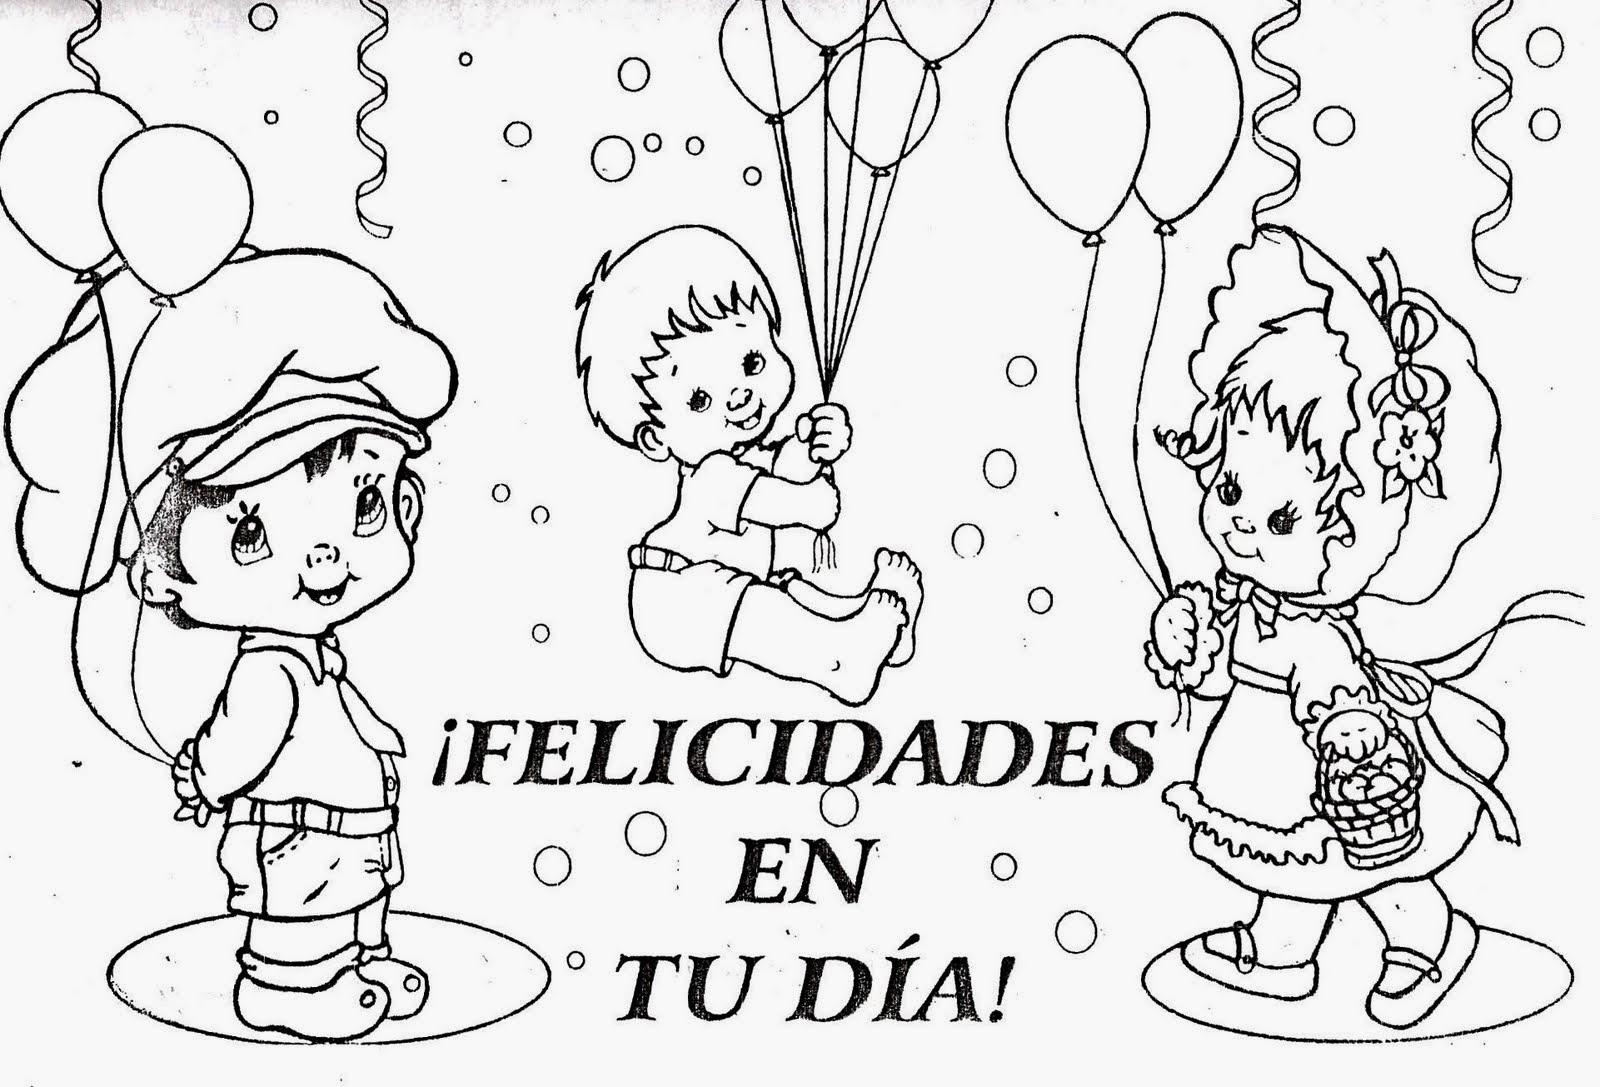 Image 20 Of 50 Dibujos Tumblr Faciles Imagui Part Of